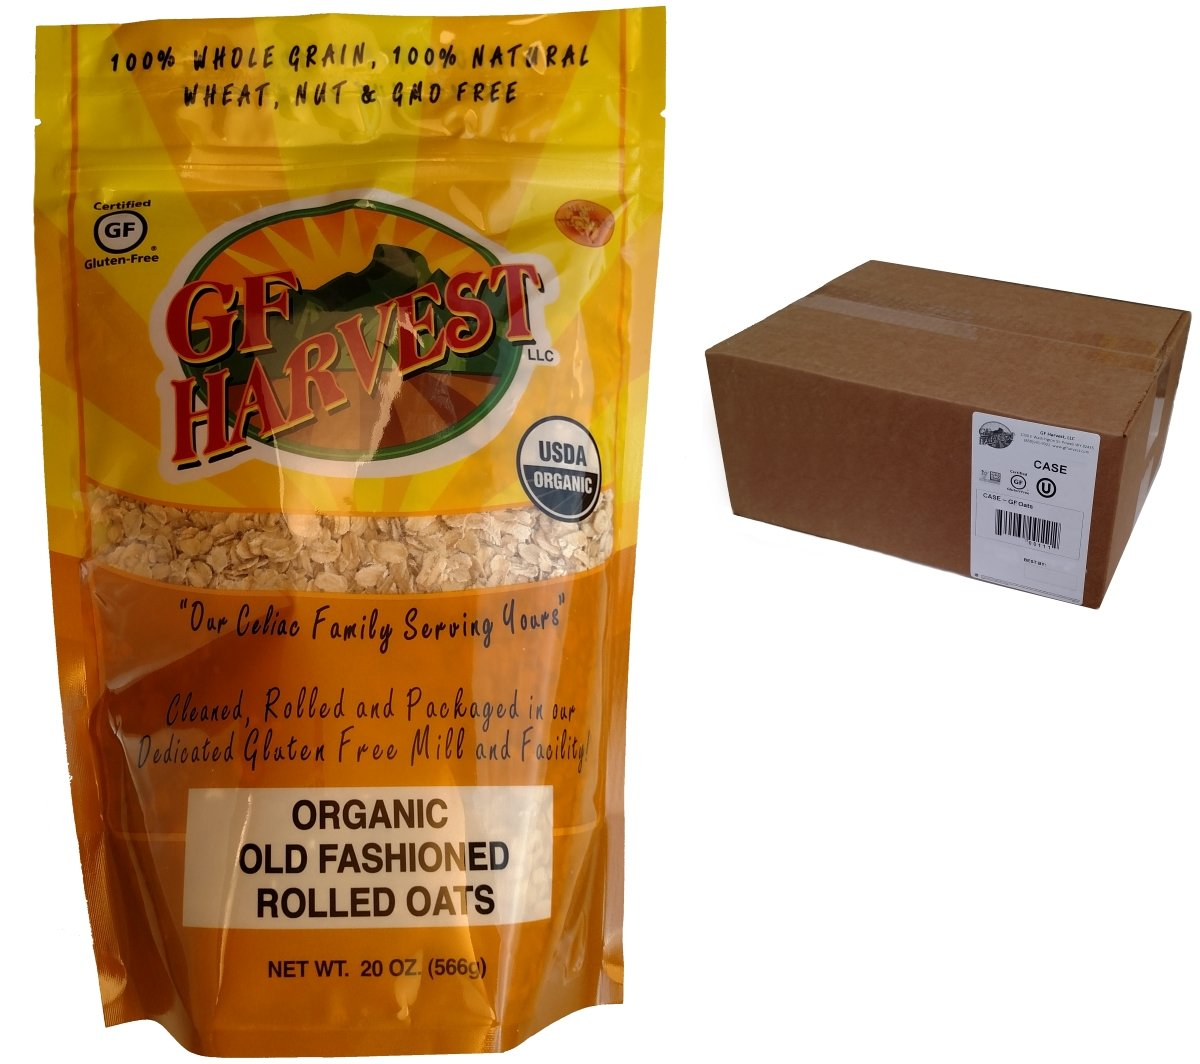 GF Harvest Gluten Free Certified Organic Rolled Oats, Non GMO, 20 oz Bag, Non-GMO, Certified Organic, 6 Count by GF Harvest